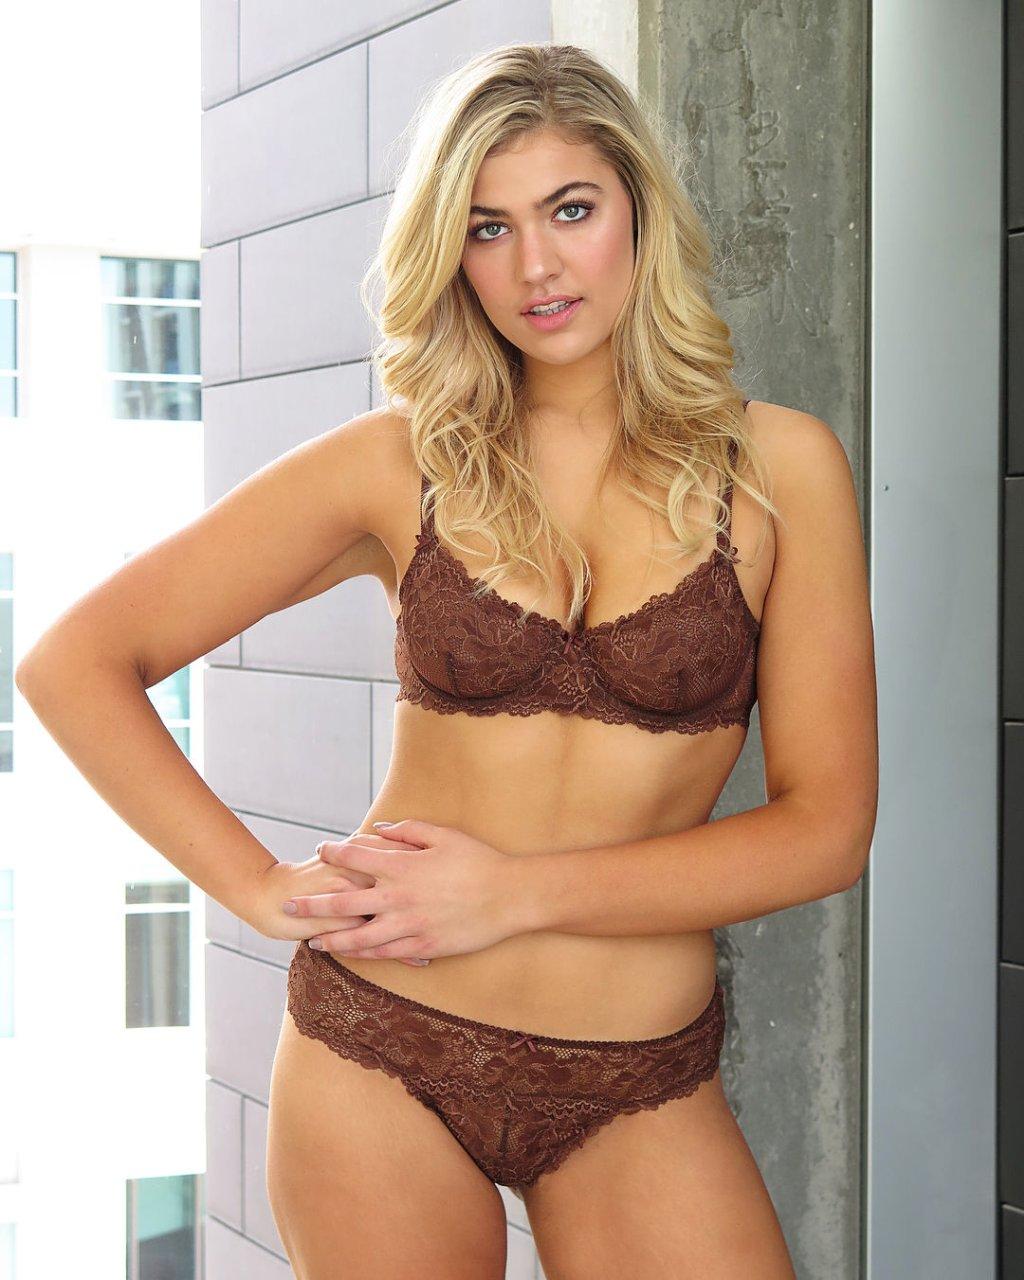 Meredith Mickelson Hot Bikini Pics